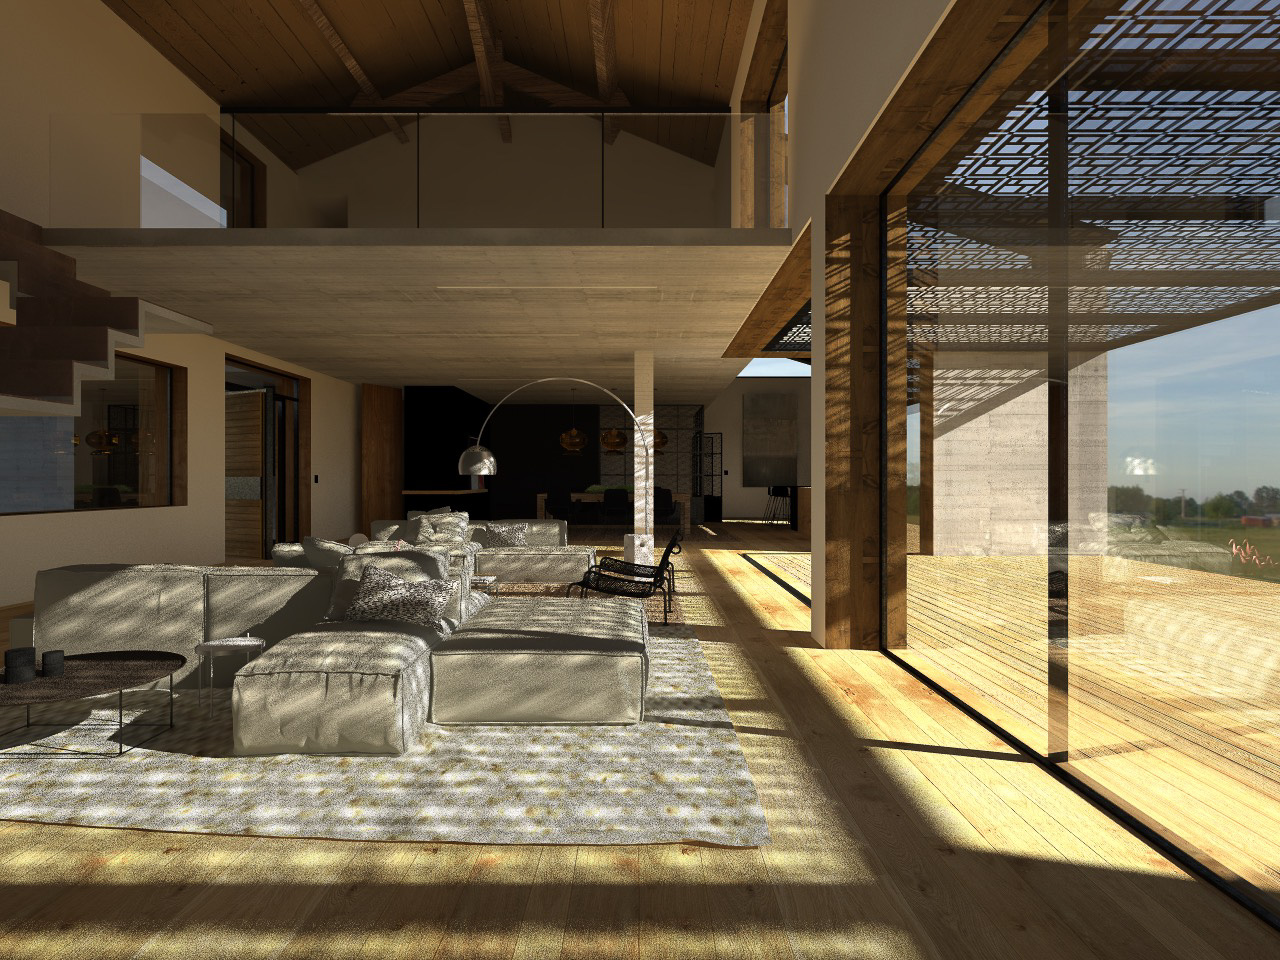 renover-rehabilitation-ferme-grange-architecte-façade-travaux-permis-de-construire-2